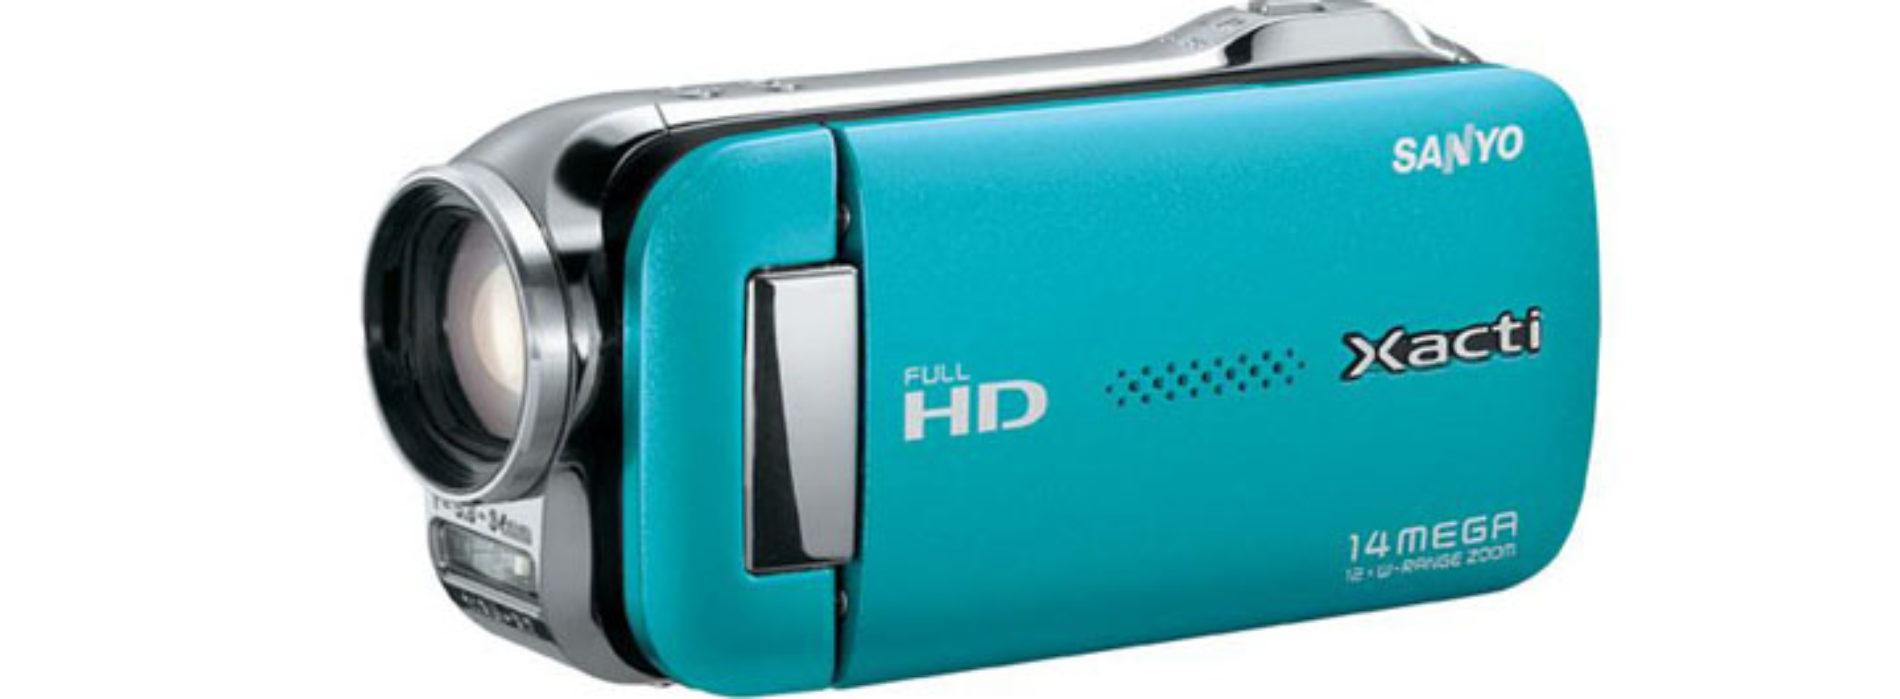 Ремонт цифровых видеокамер Sanyo